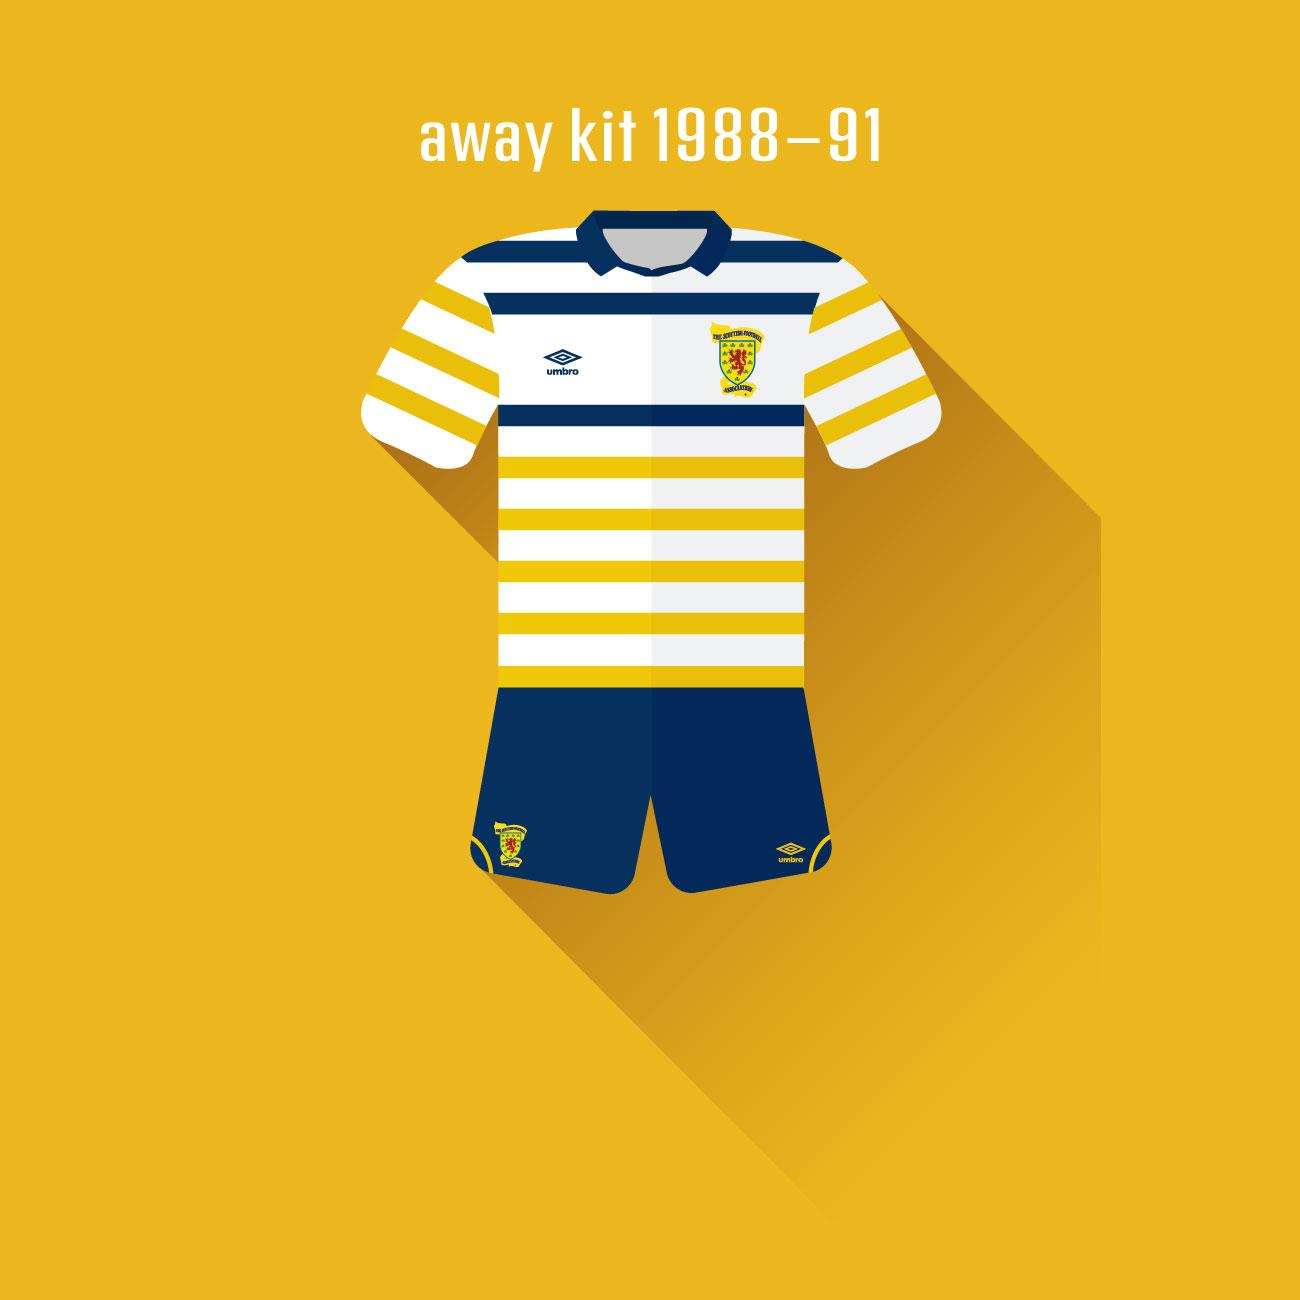 scotland-away-88-91